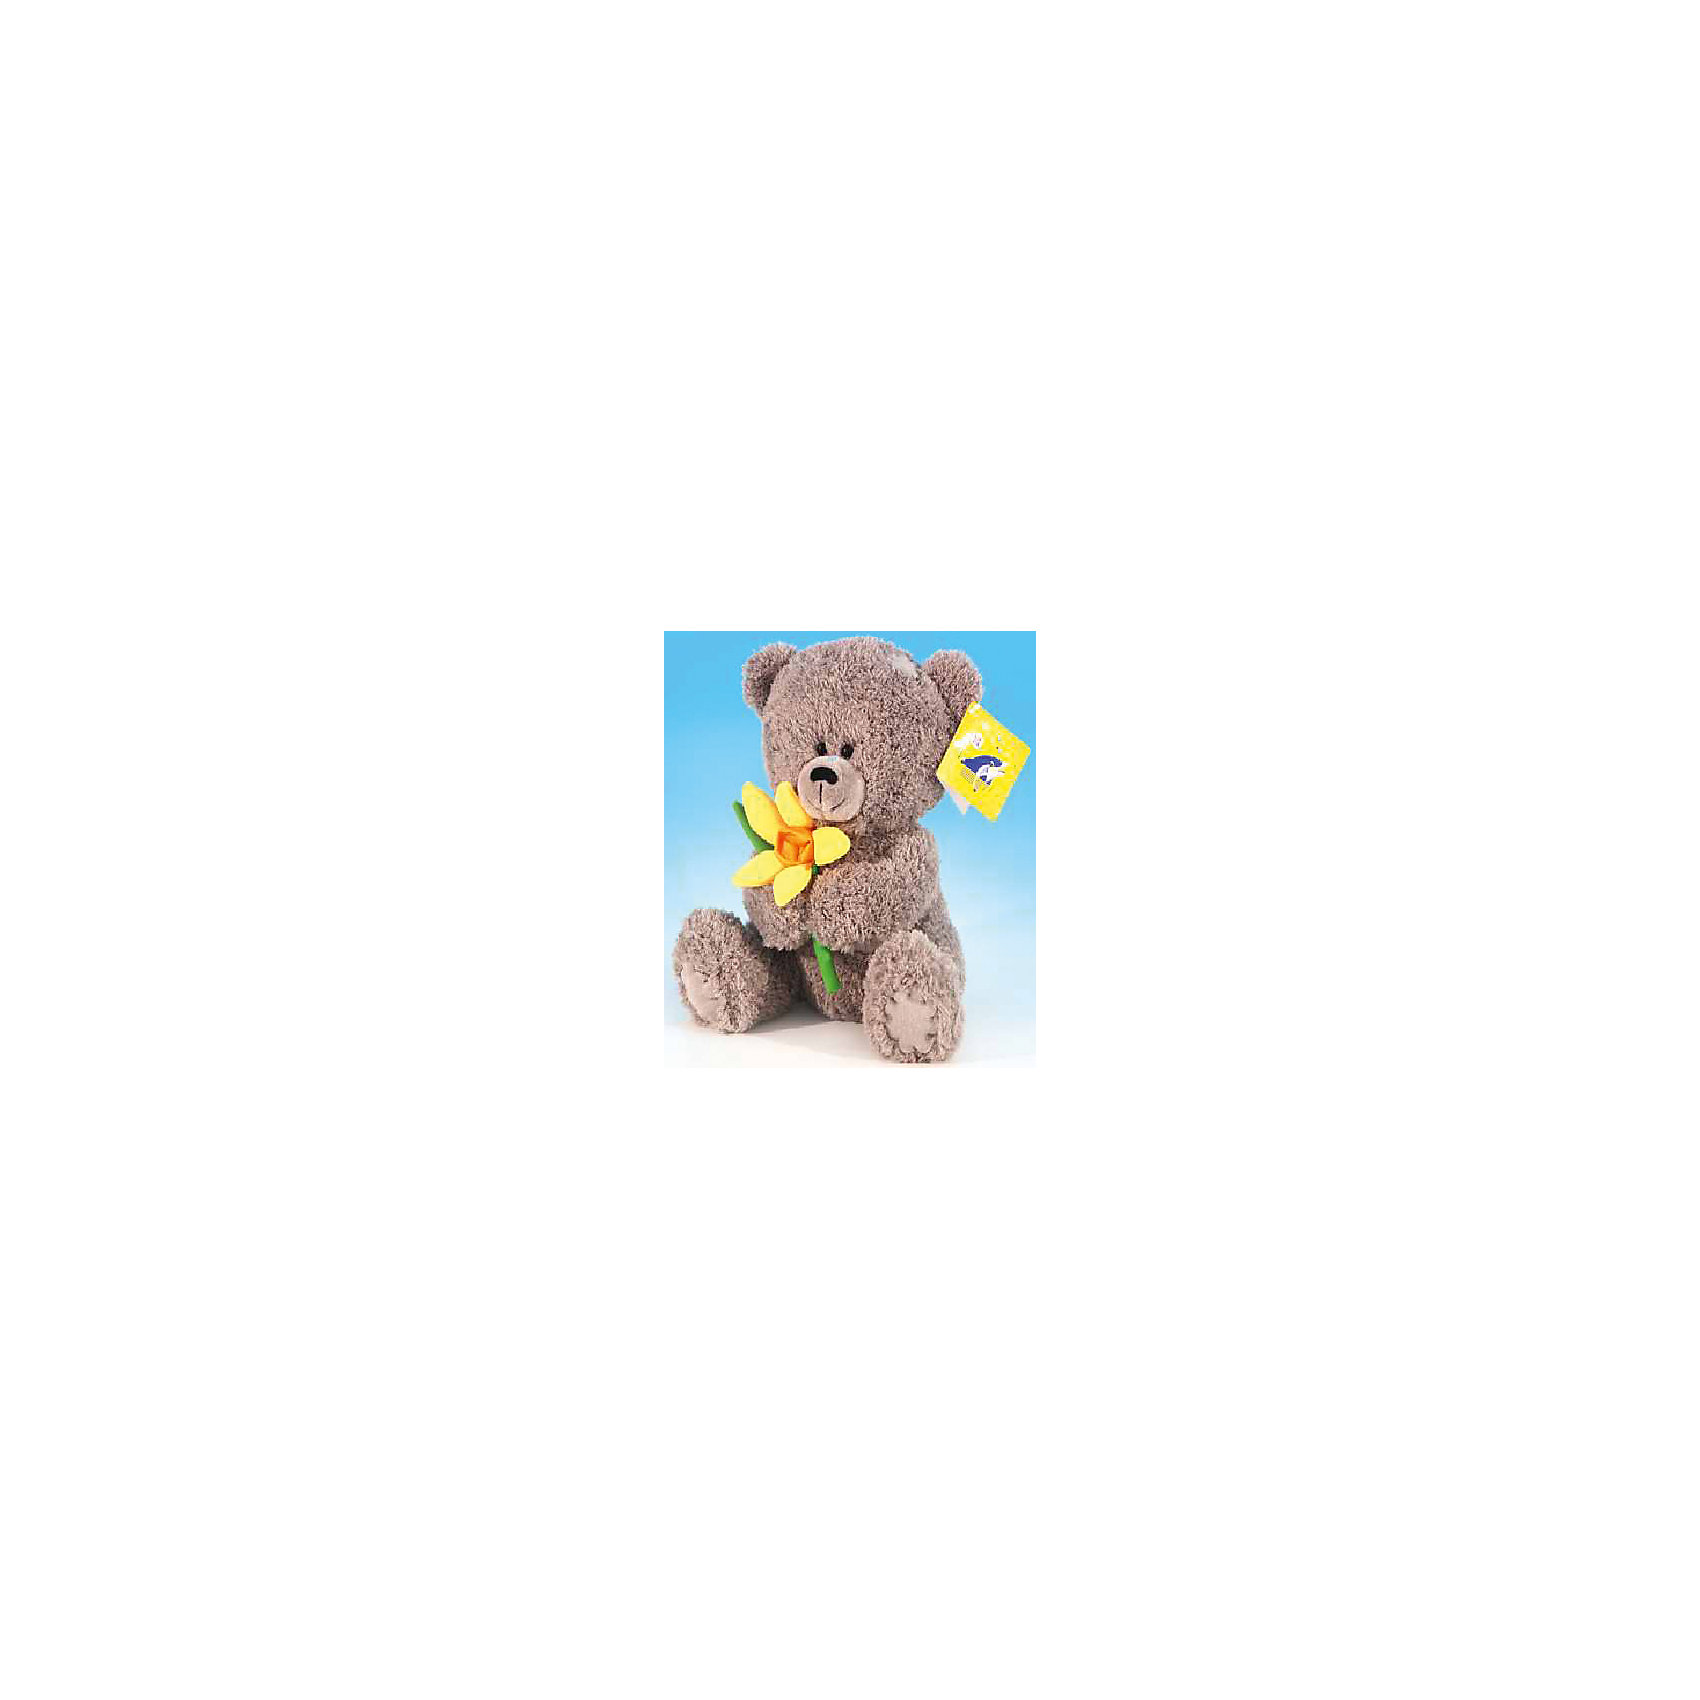 LAVA Медвежонок с нарциссом, музыкальный, 20см., LAVA lava бобер музыкальный 19 см